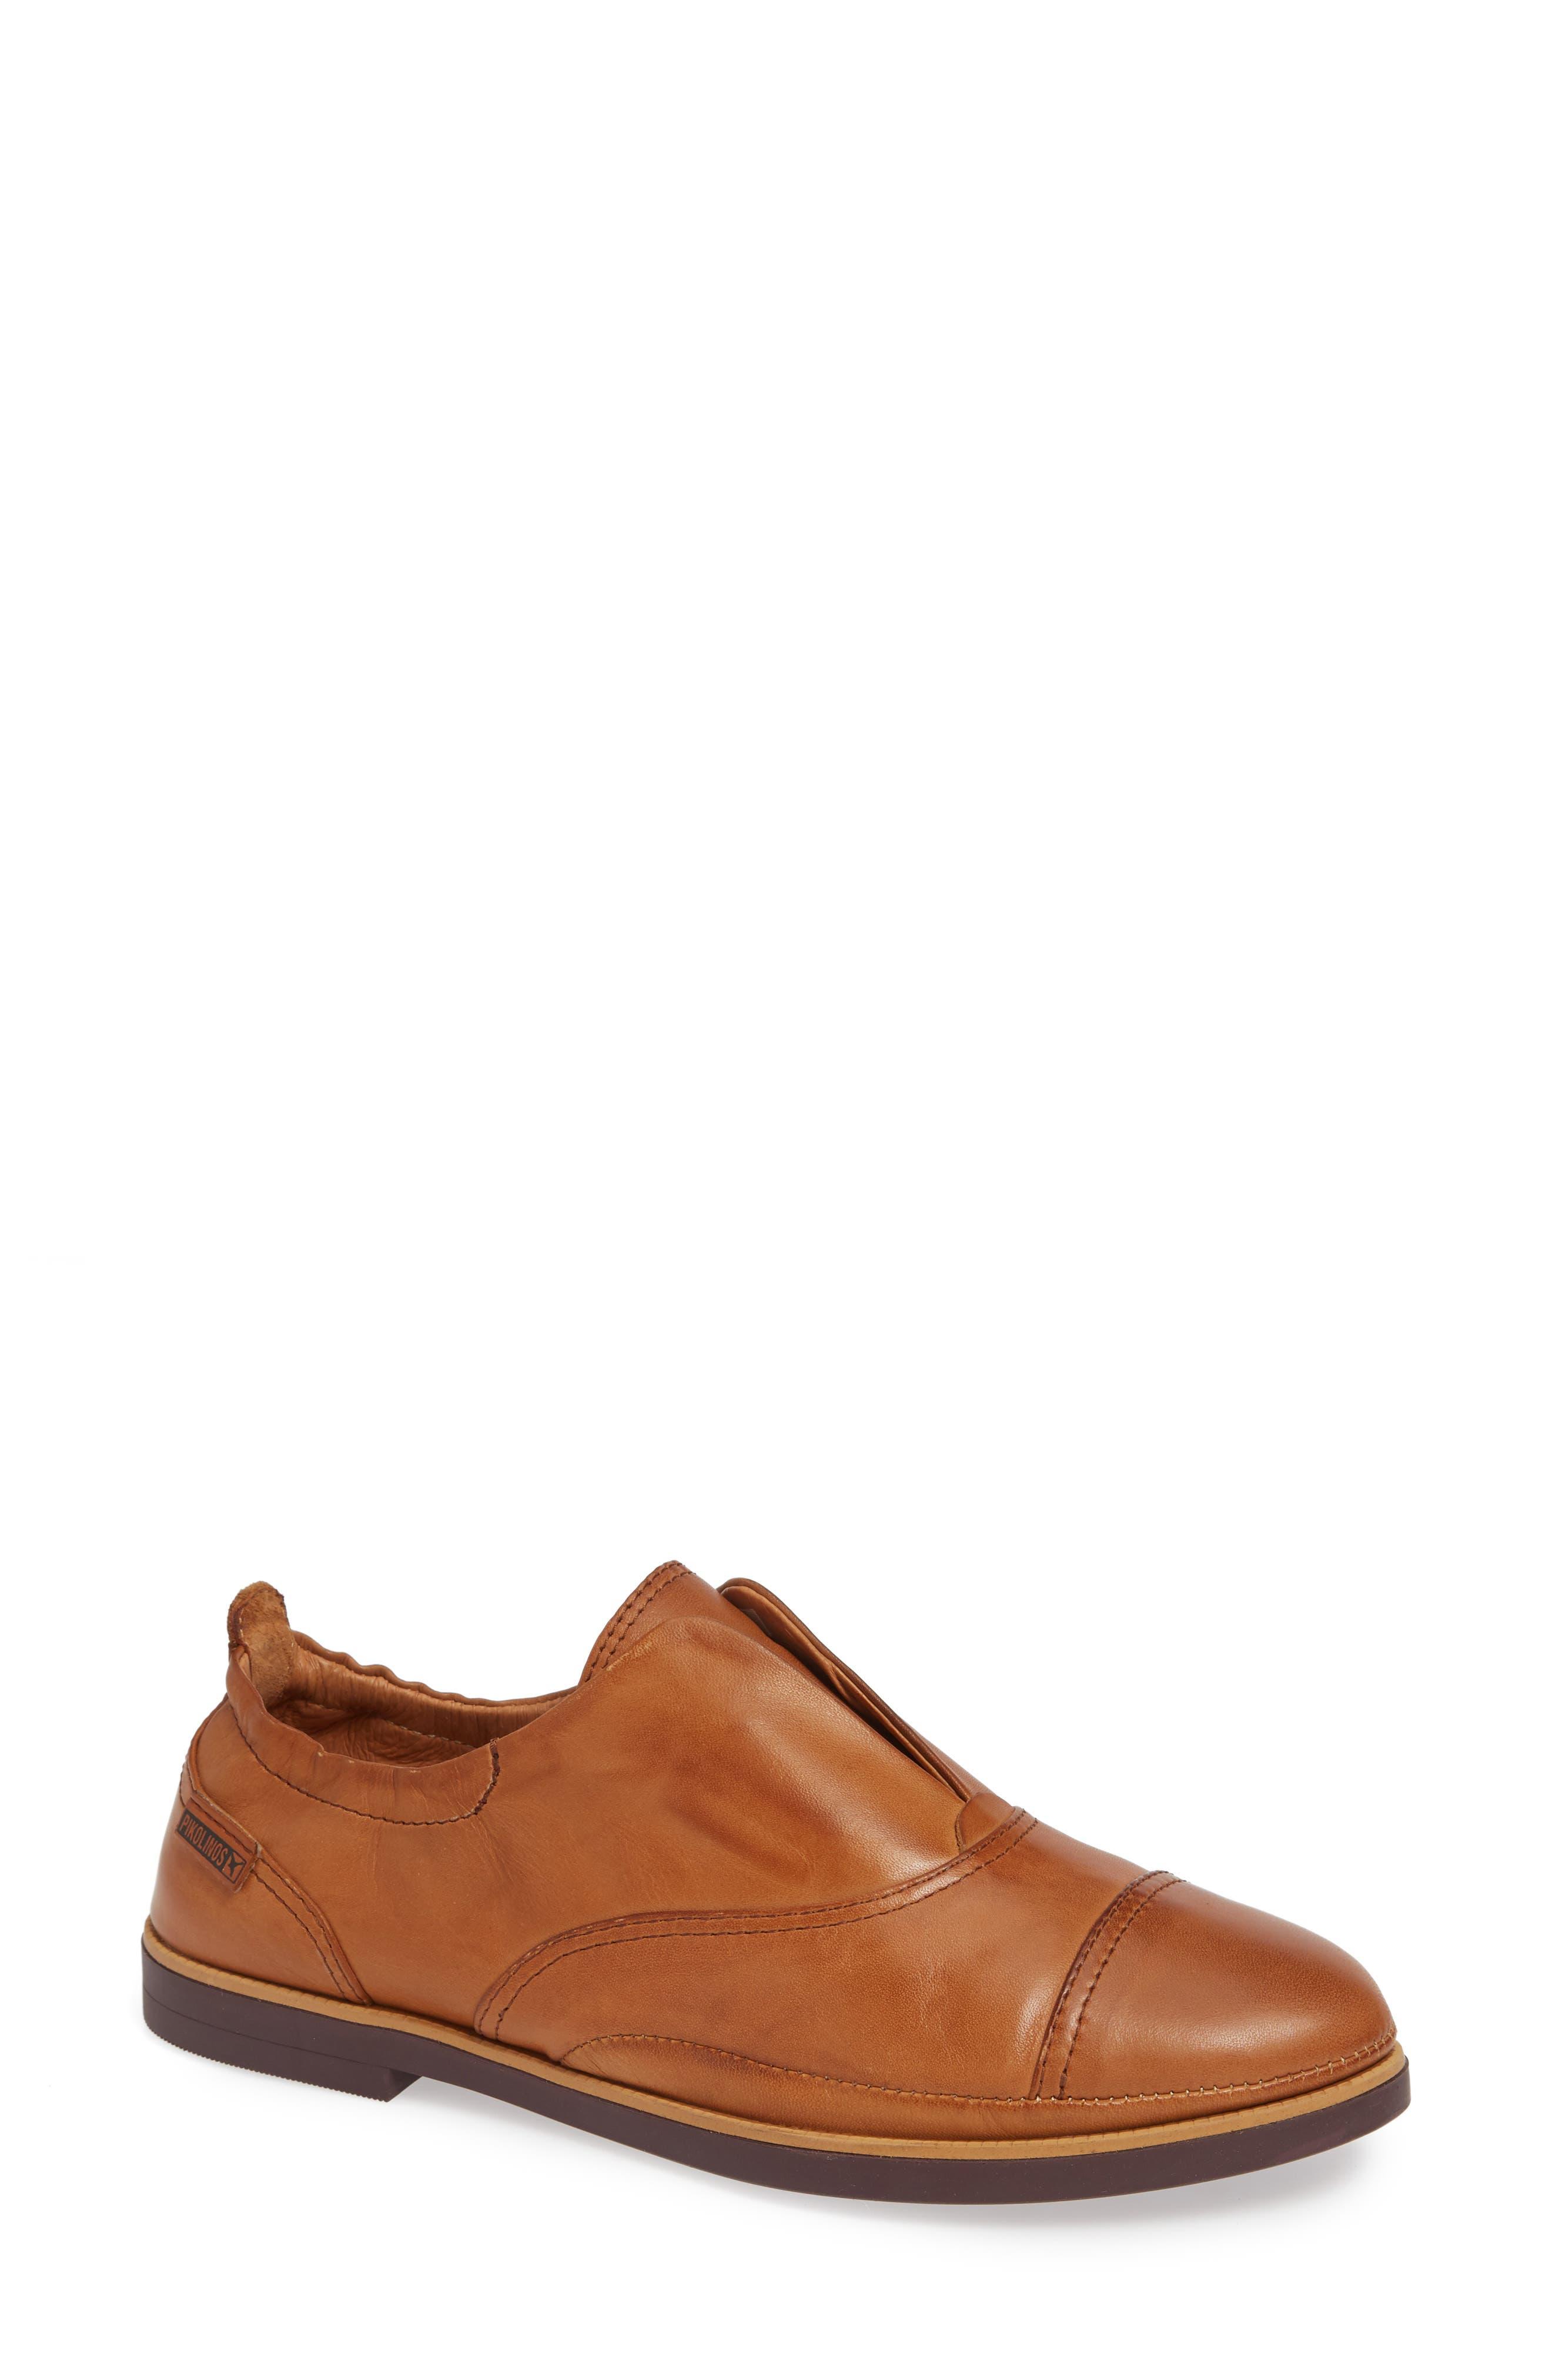 Pikolinos Santorini Colorblock Laceless Oxford, Brown